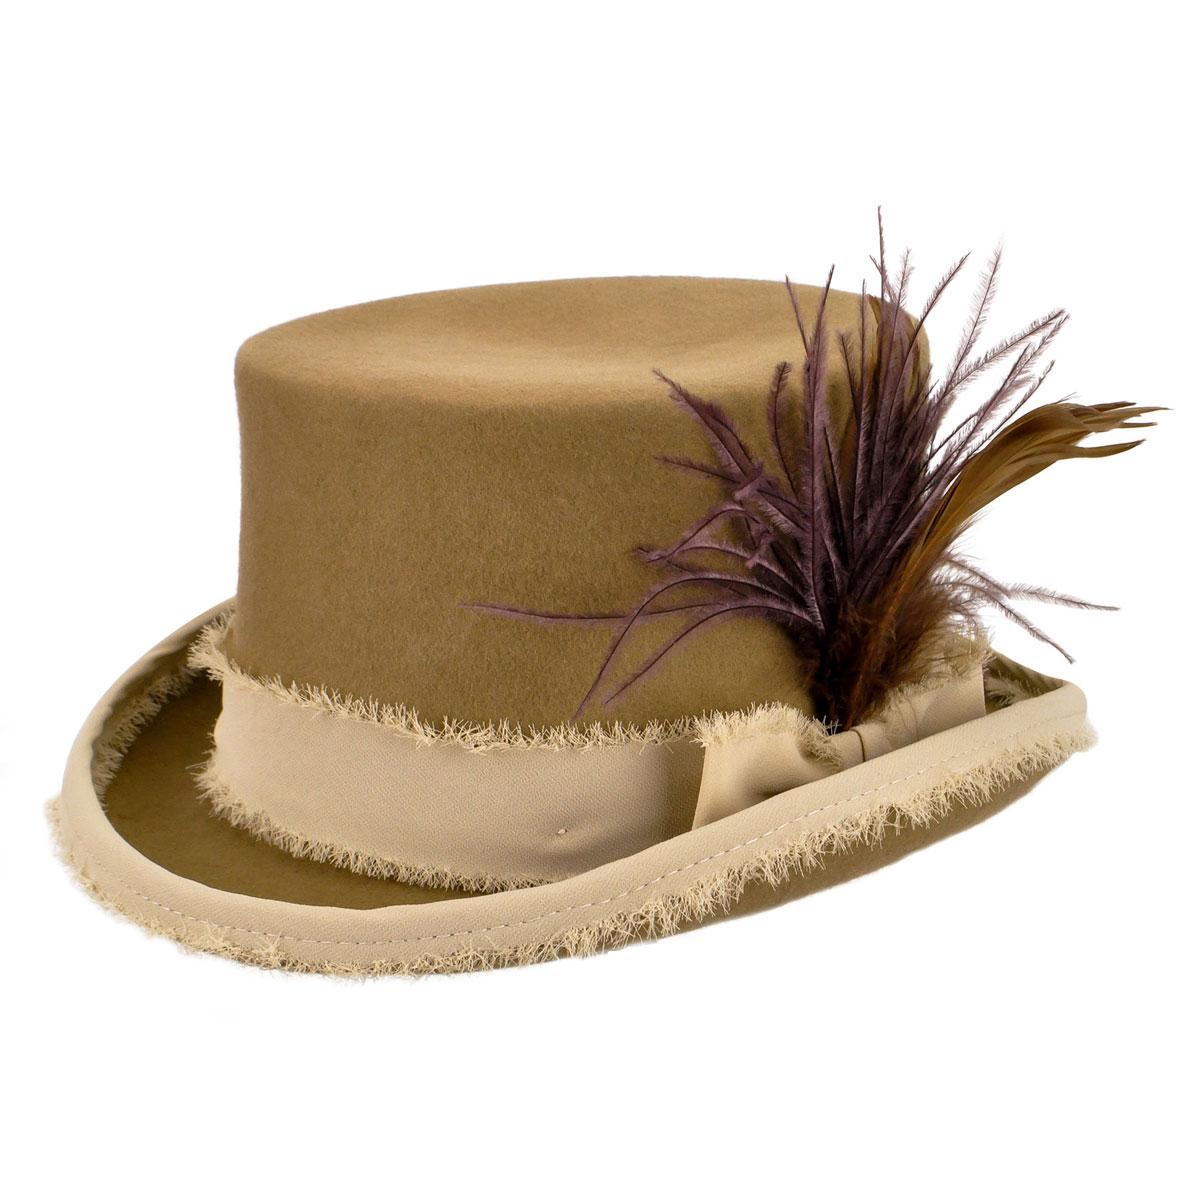 Renegade Renegade by Bailey Vivienne Top Hat in Tan